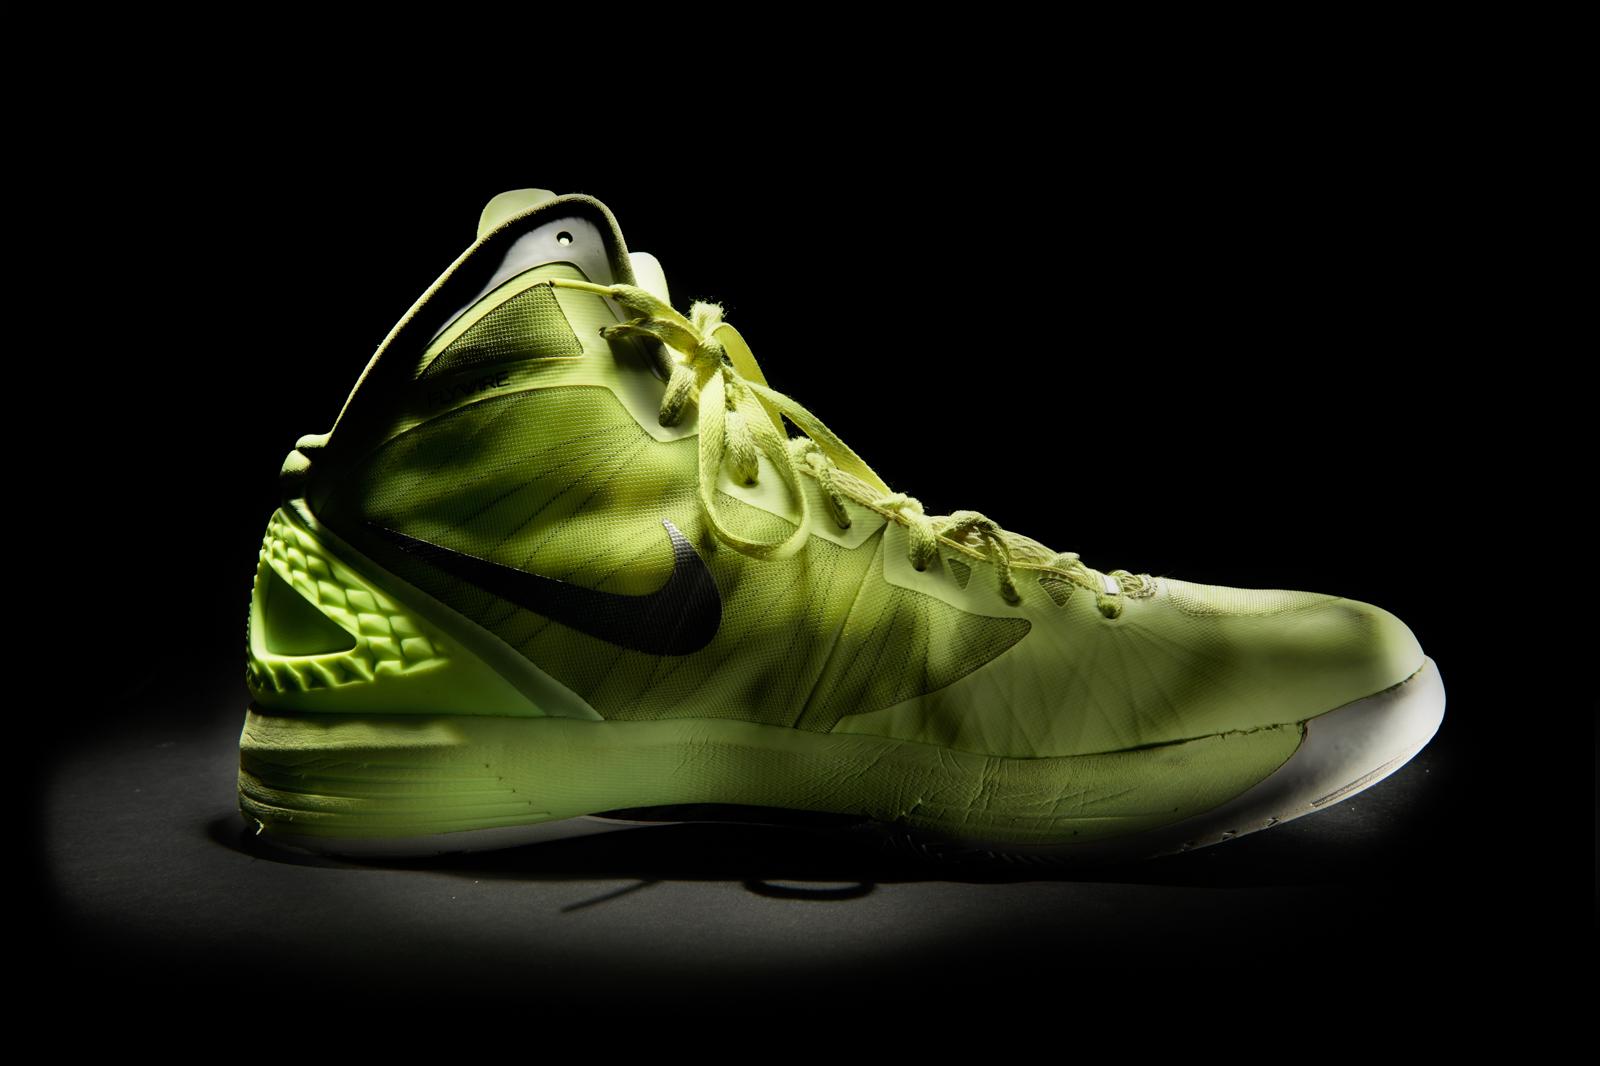 shoes_005.jpg